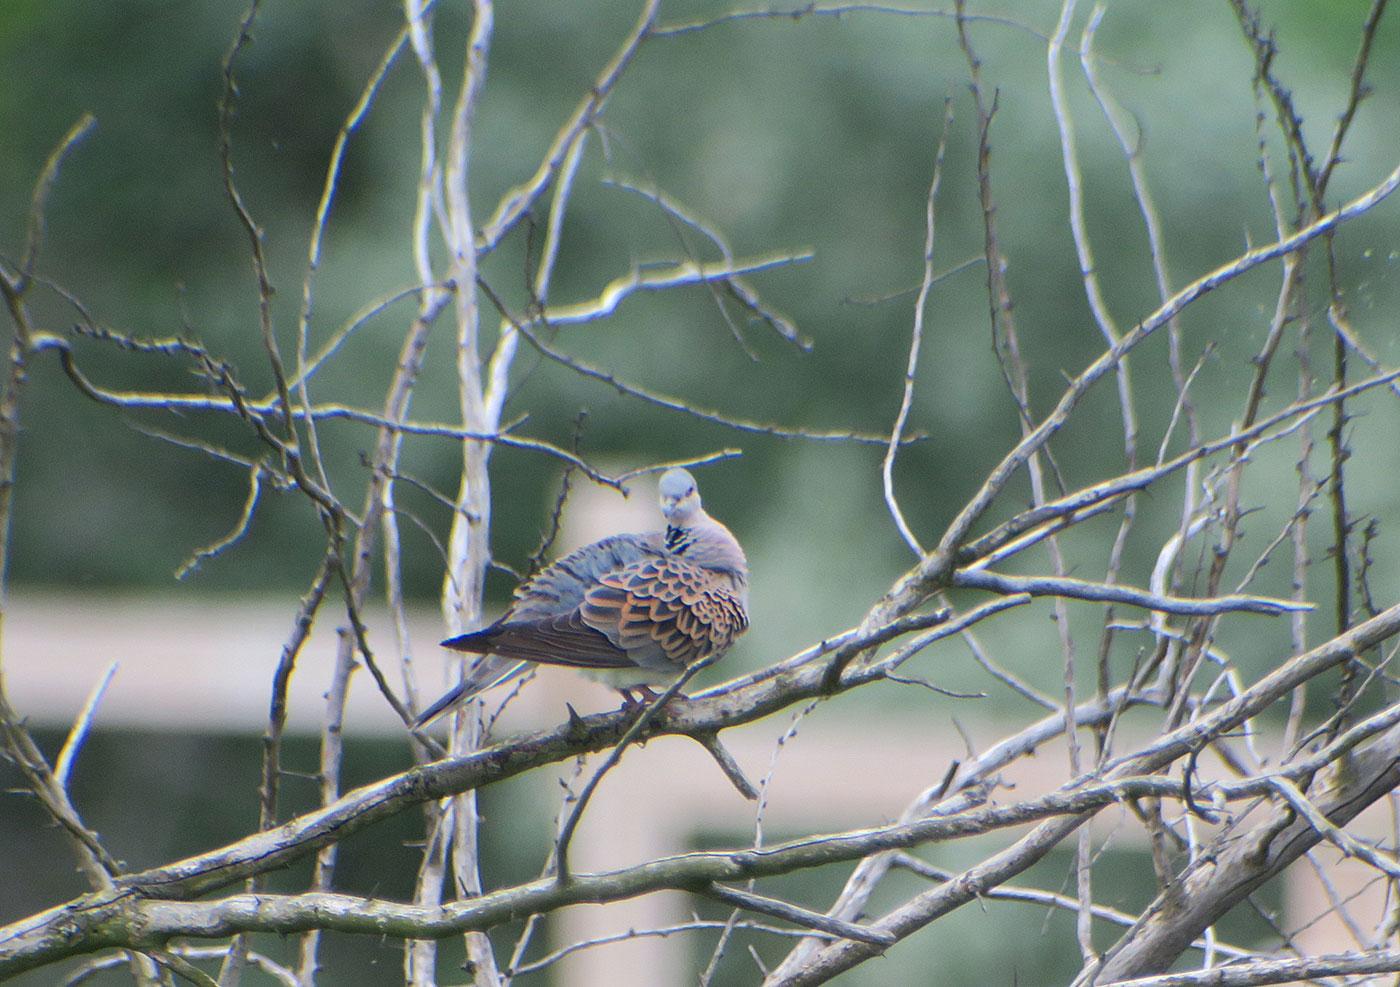 22_turteltaube_european-turtle-dove_pferdestall_2019-05-21_0583